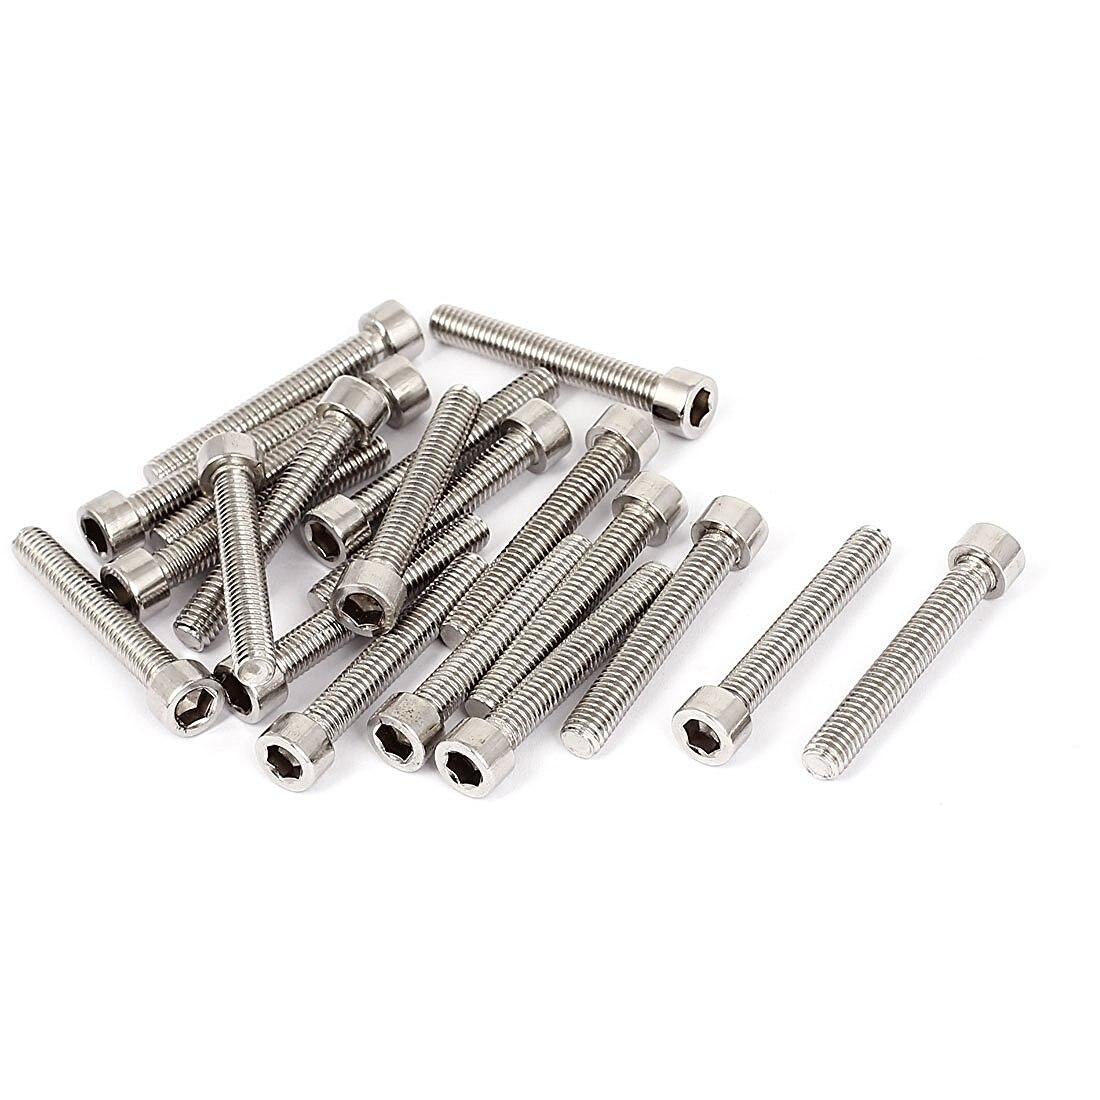 M6x40mm Stainless Steel Hex Socket Head Cap Screws Bolts DIN 912 20pcs 20pcs m3 6 m3 x 6mm aluminum anodized hex socket button head screw